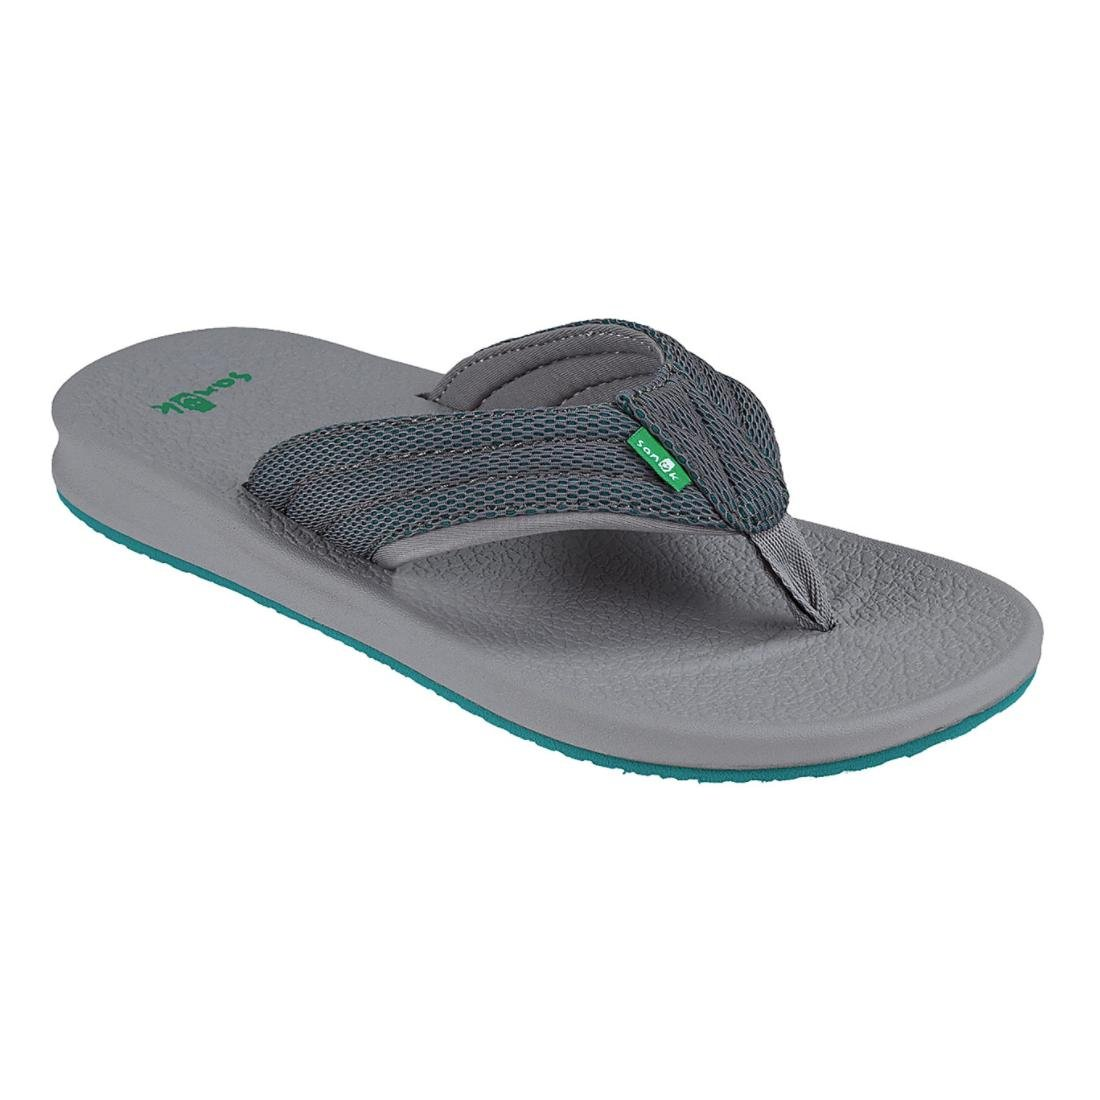 Sanuk Men's Brumeister Mesh Flip-Flop Charcoal/Grau/Teal